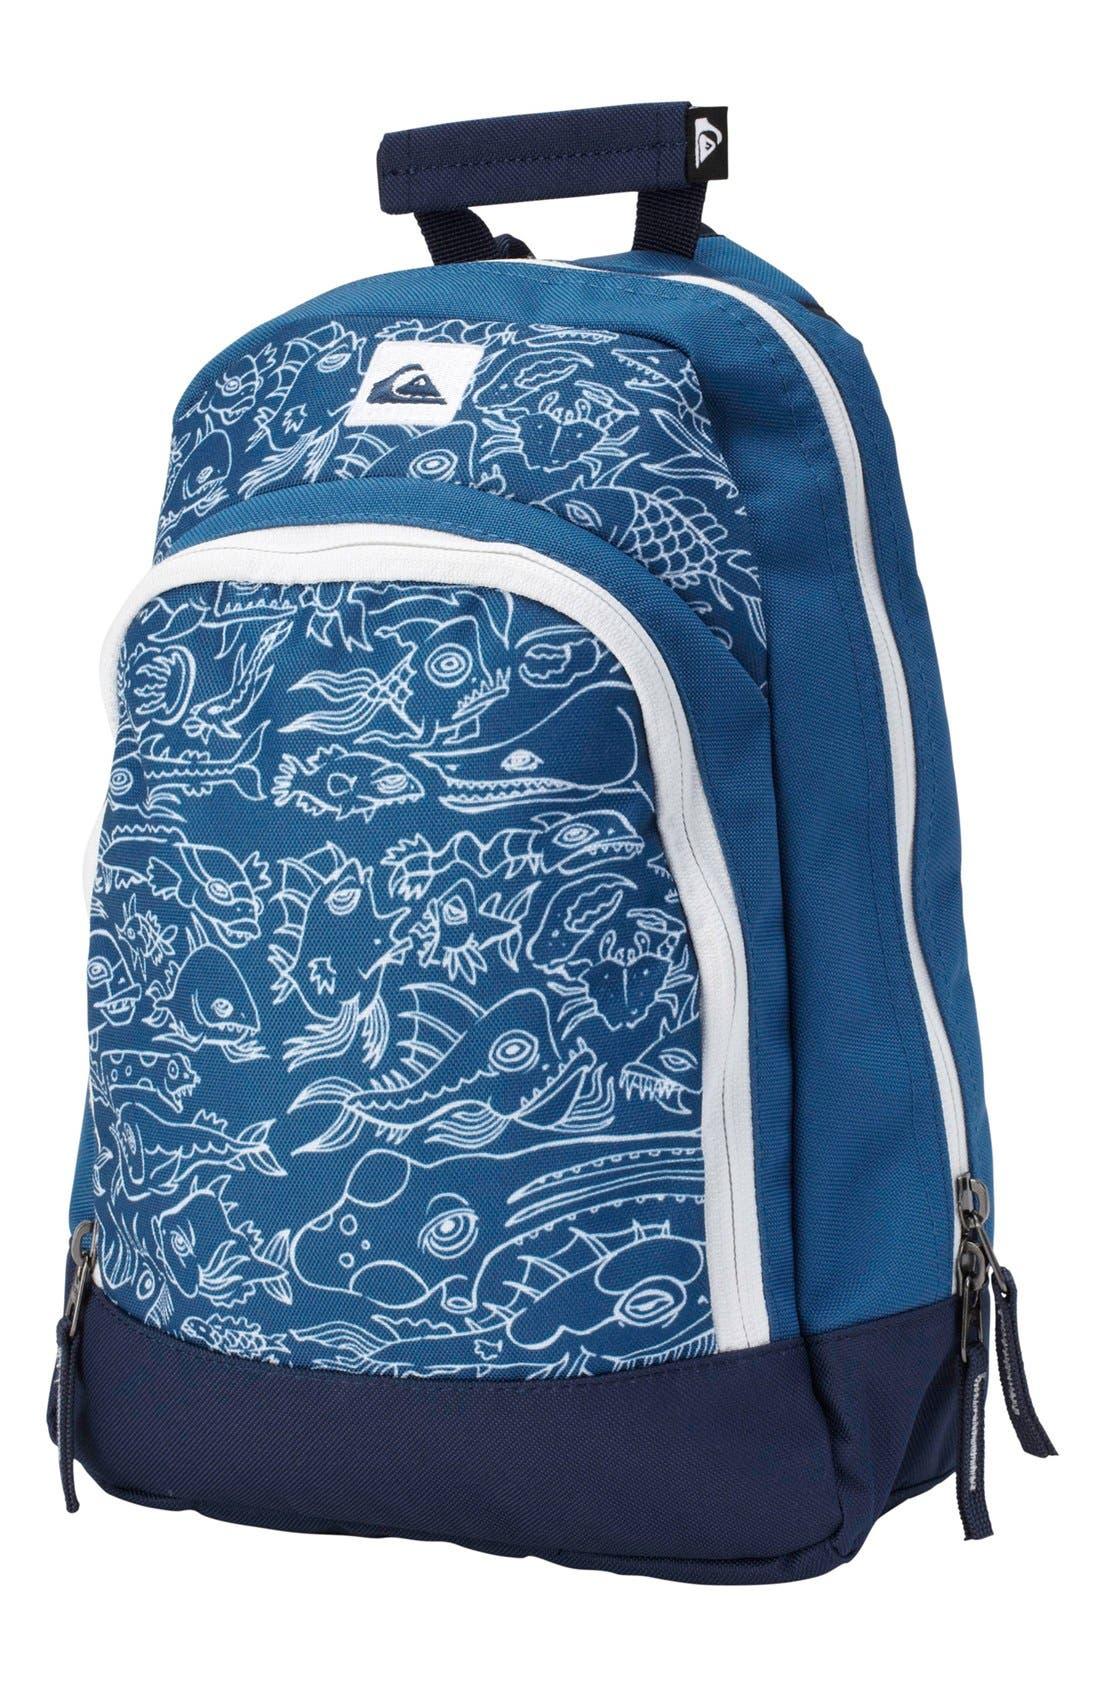 Main Image - Quiksilver 'Chomper' Backpack